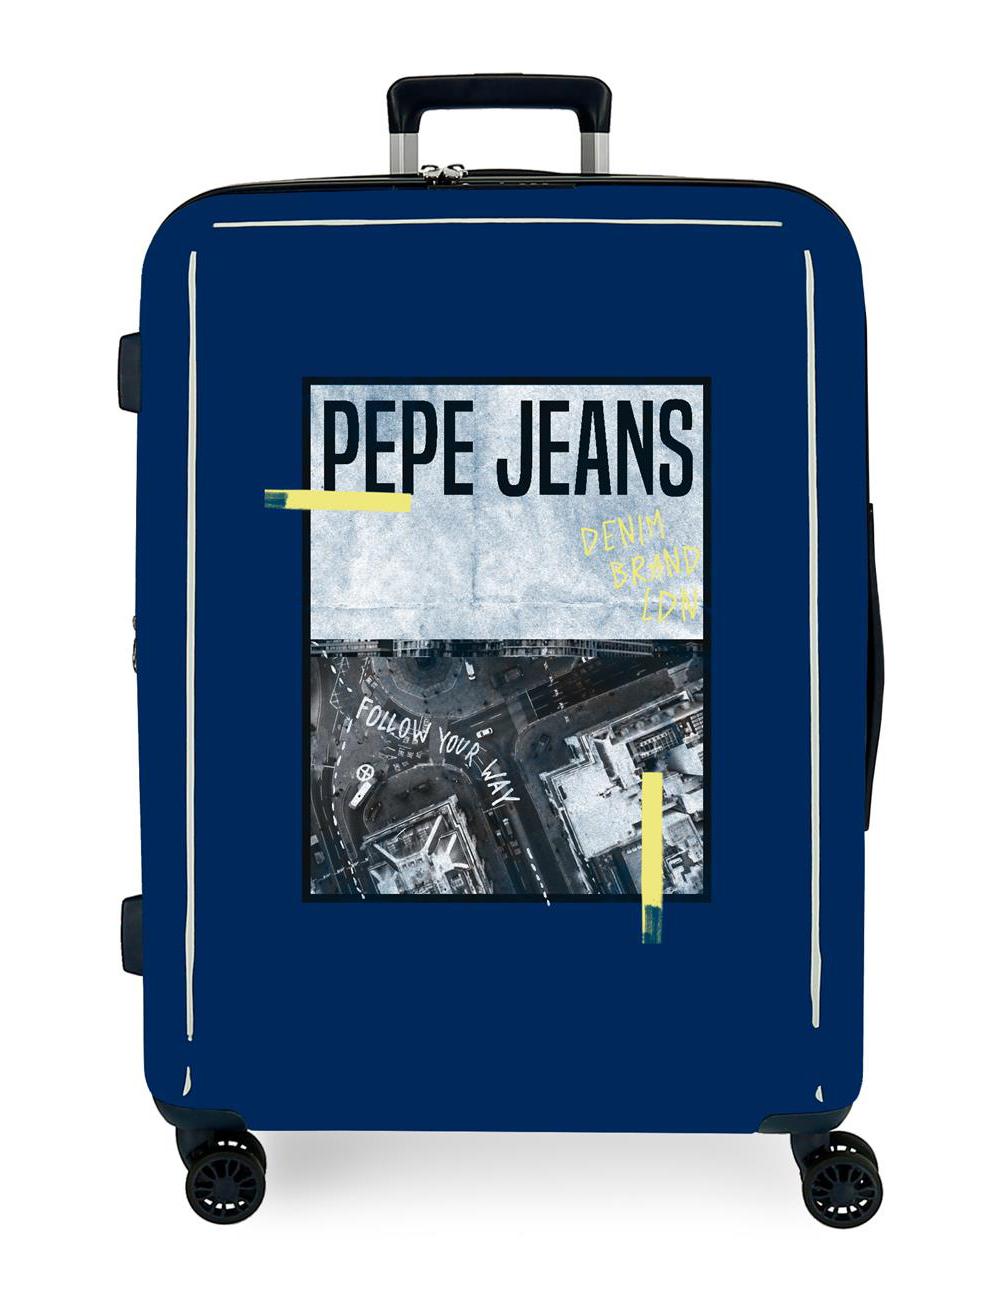 7929428 Maleta Mediana Pepe Jeans Nolan Crispin Denim